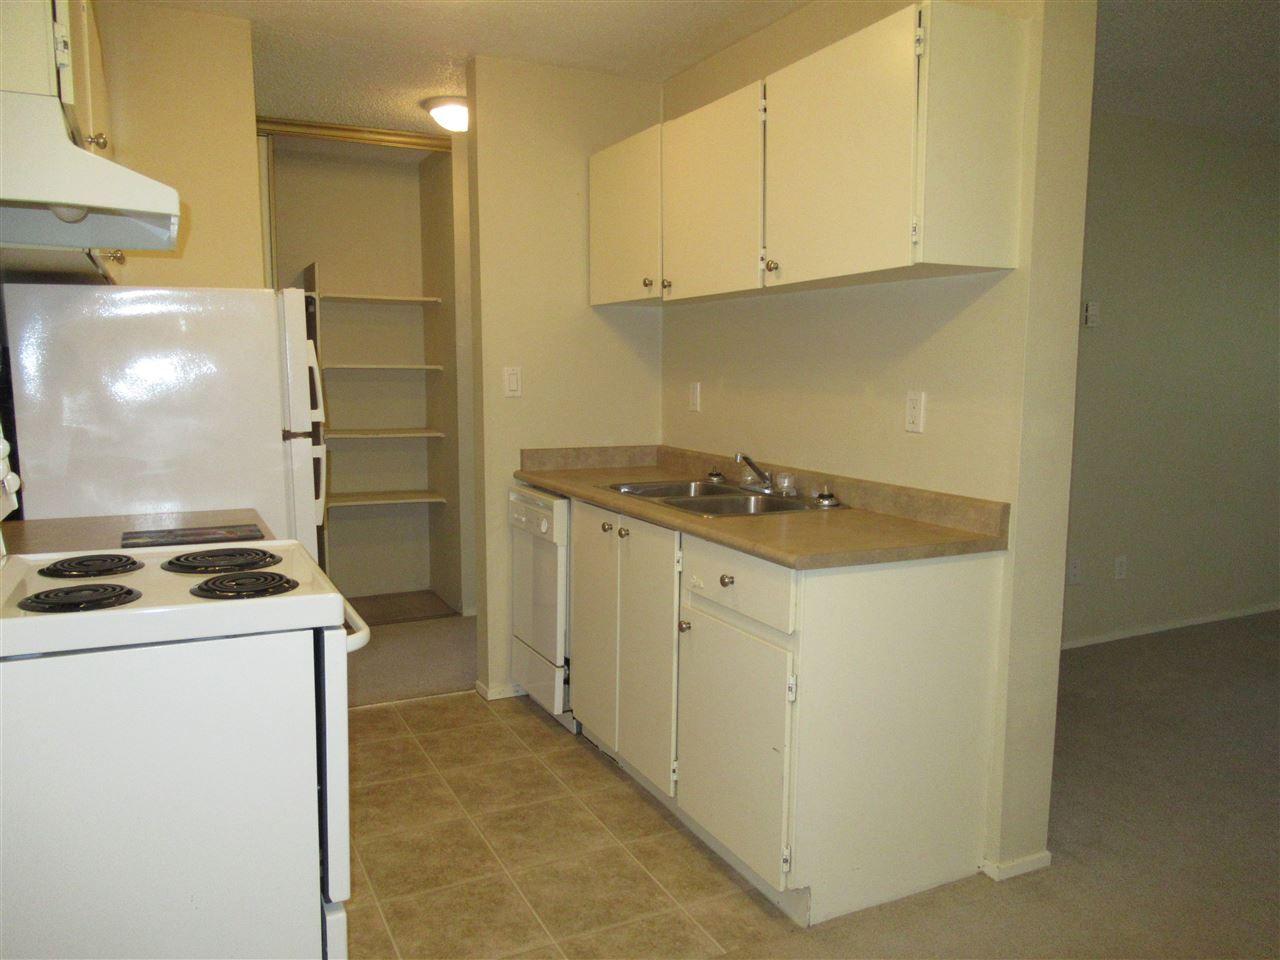 Photo 11: Photos: 103 280 N BROADWAY Avenue in Williams Lake: Williams Lake - City Condo for sale (Williams Lake (Zone 27))  : MLS®# R2455569